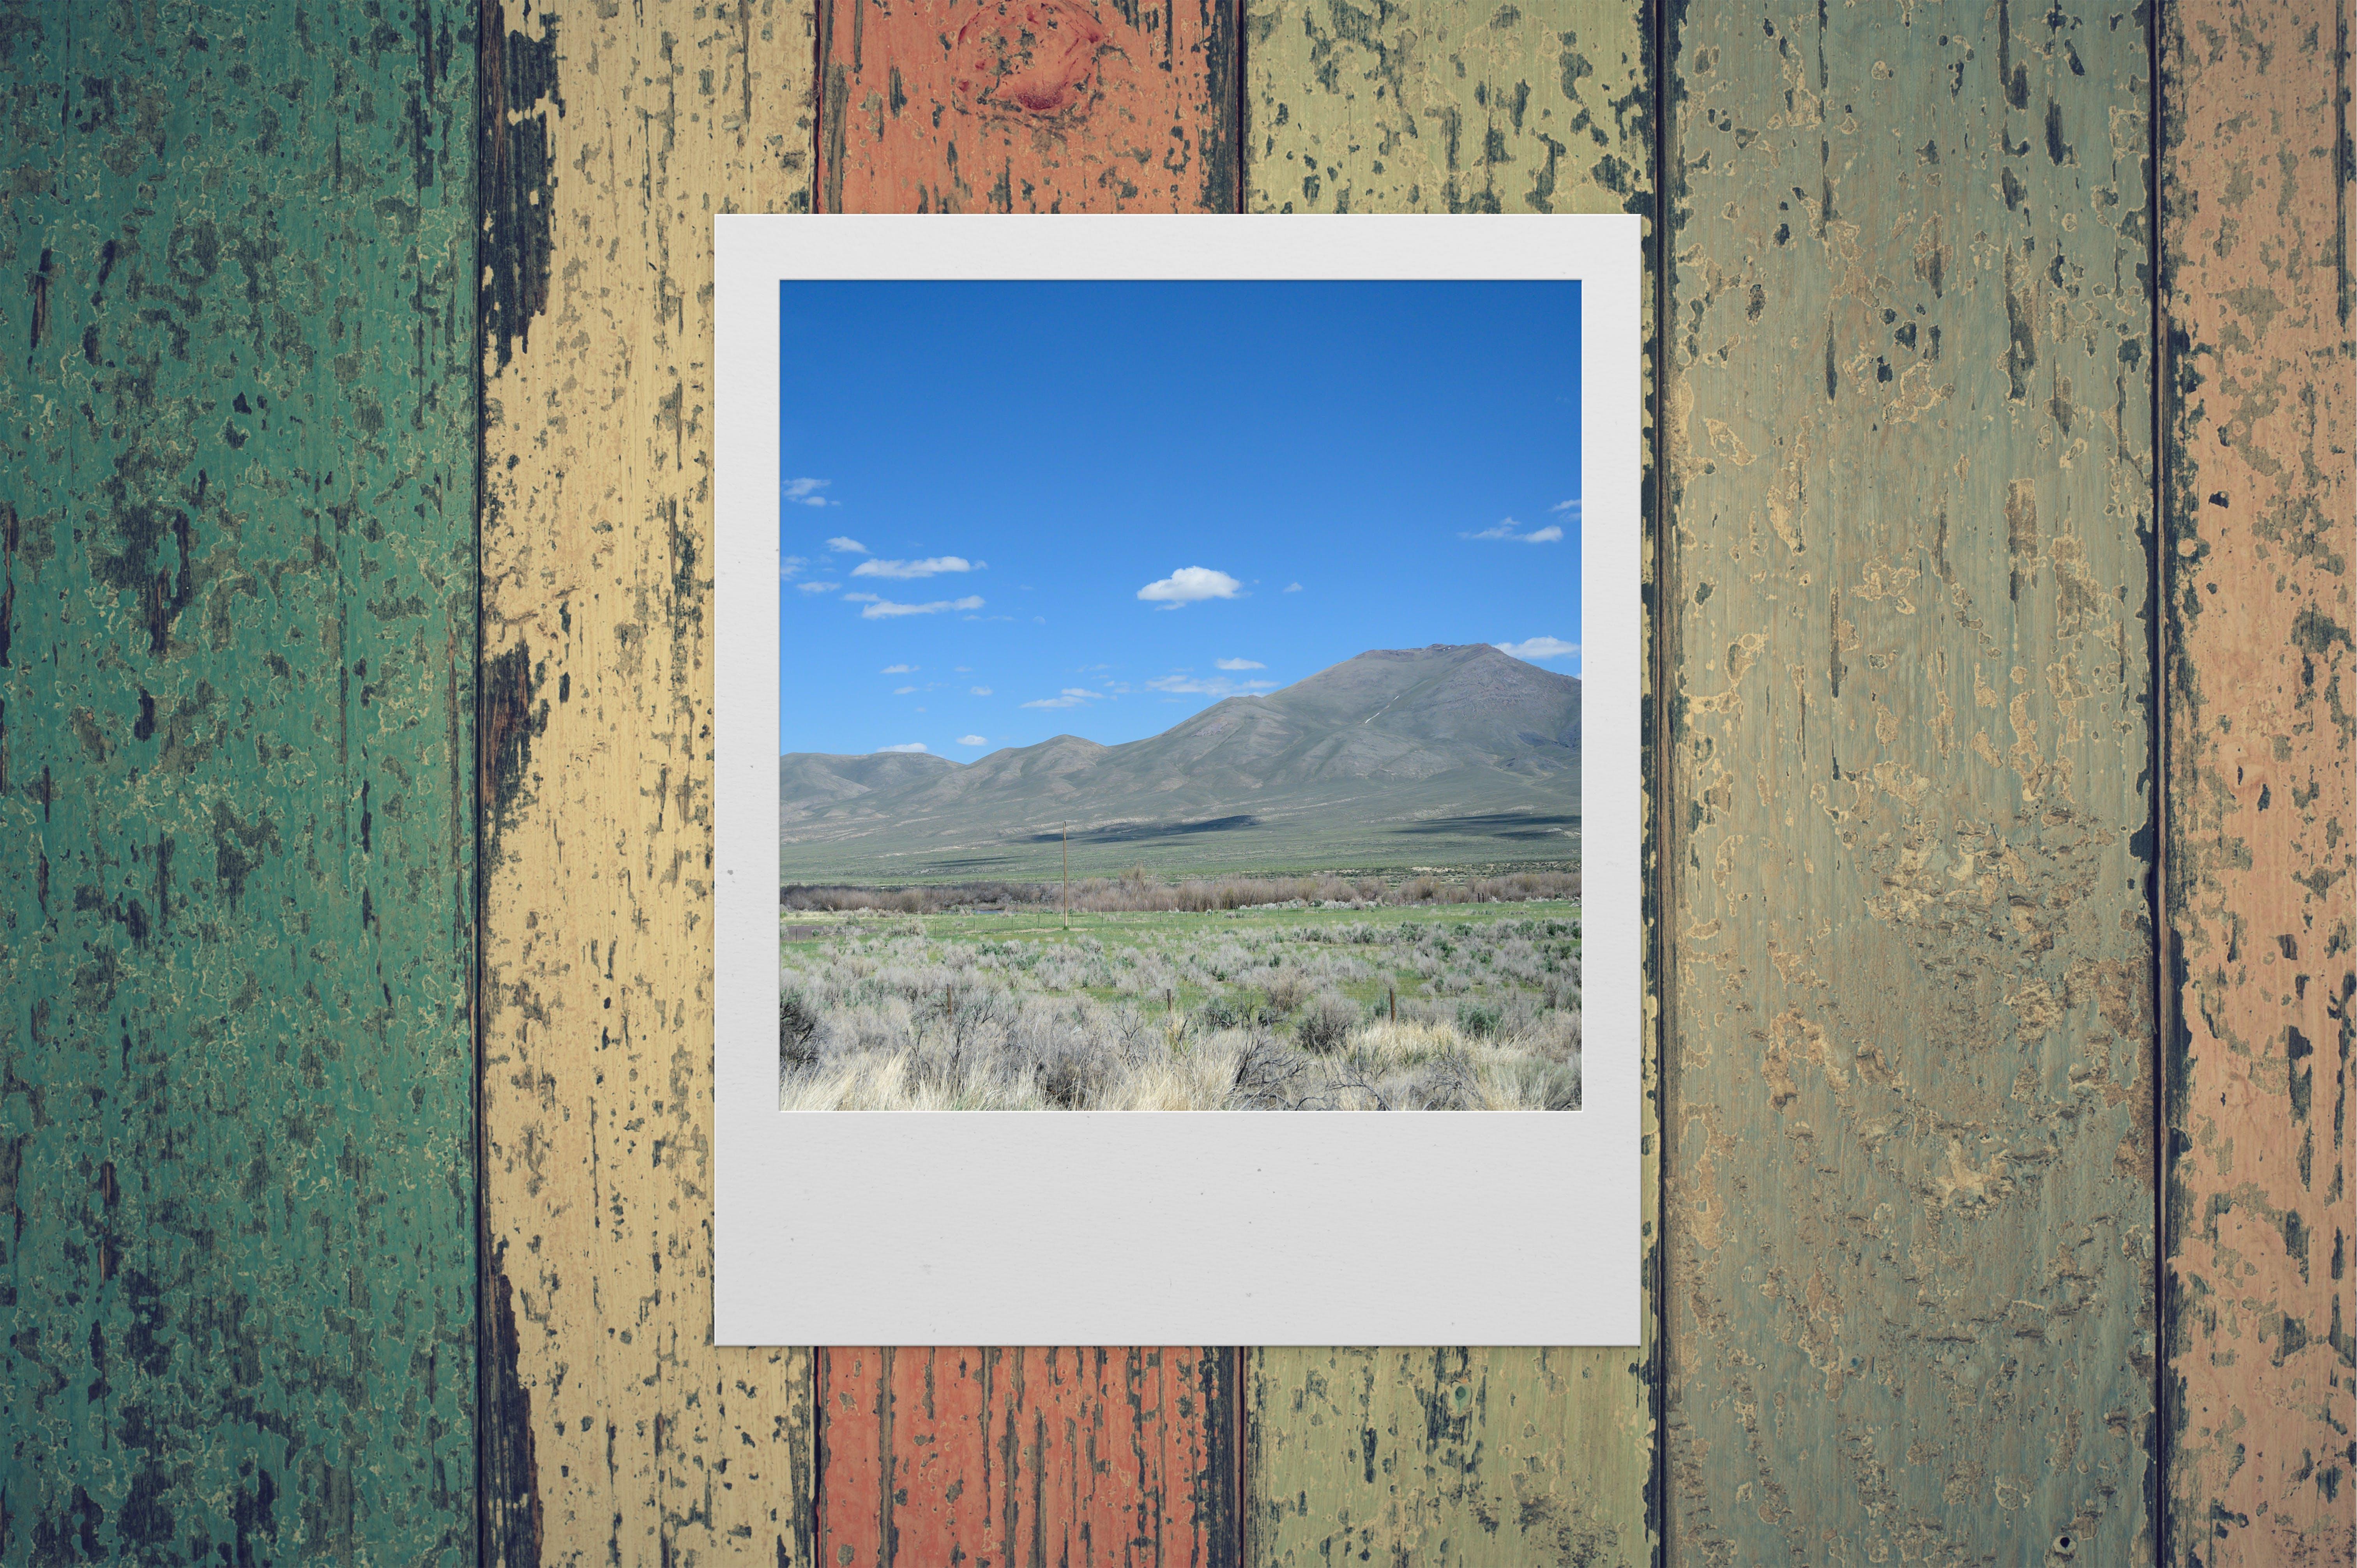 Foto stok gratis bingkai gambar, foto, gunung, kayu